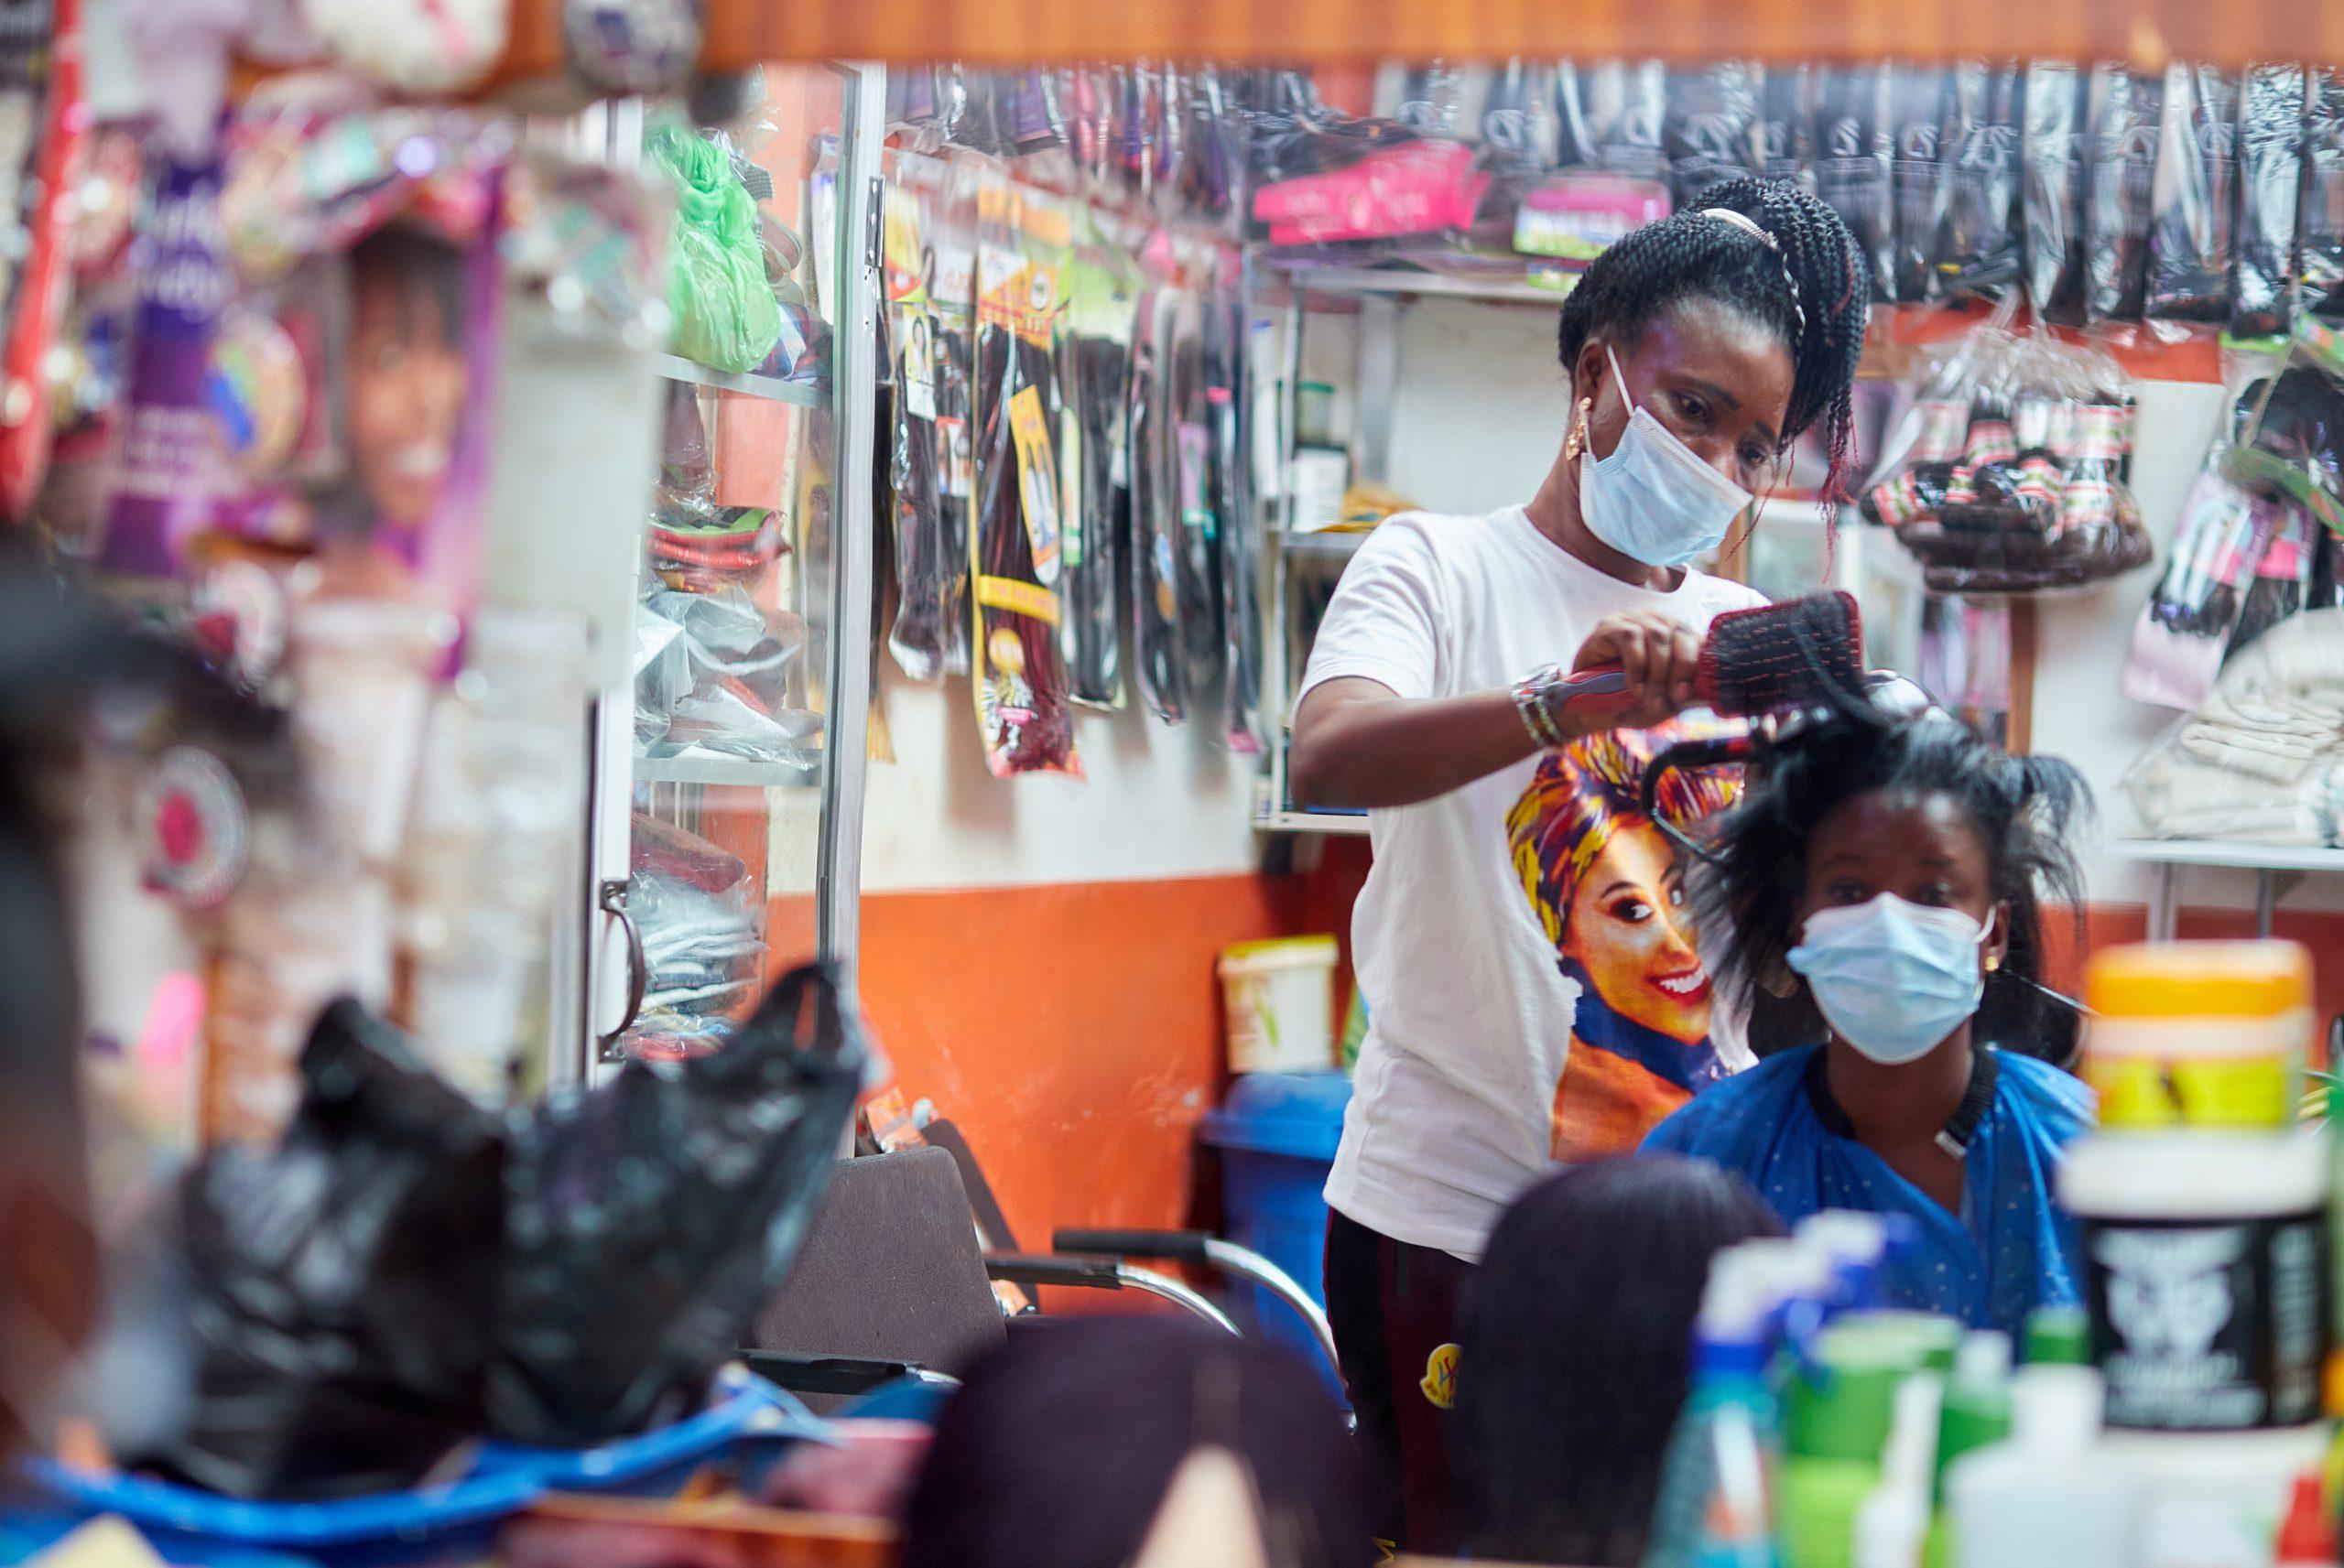 A Ghanaian hairdresser and her customer.